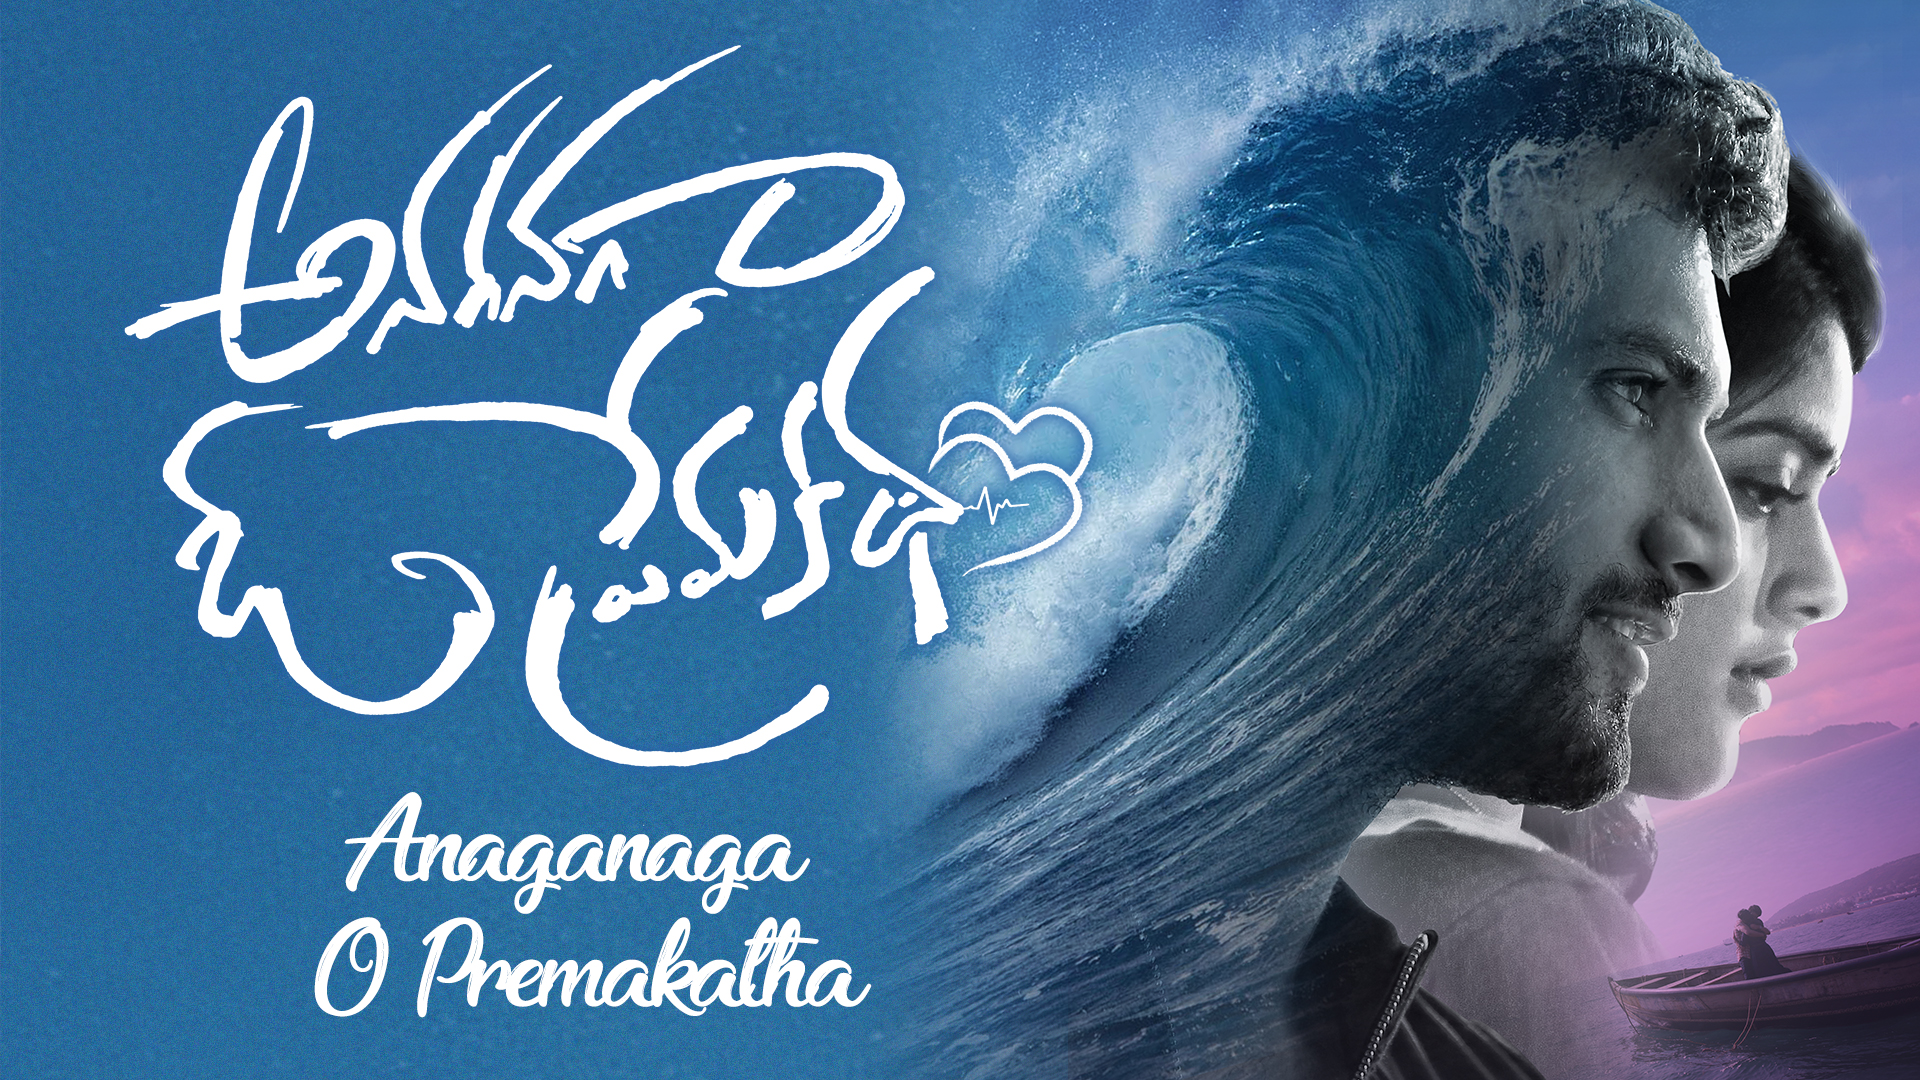 Anaganaga O Premakatha (Telugu)